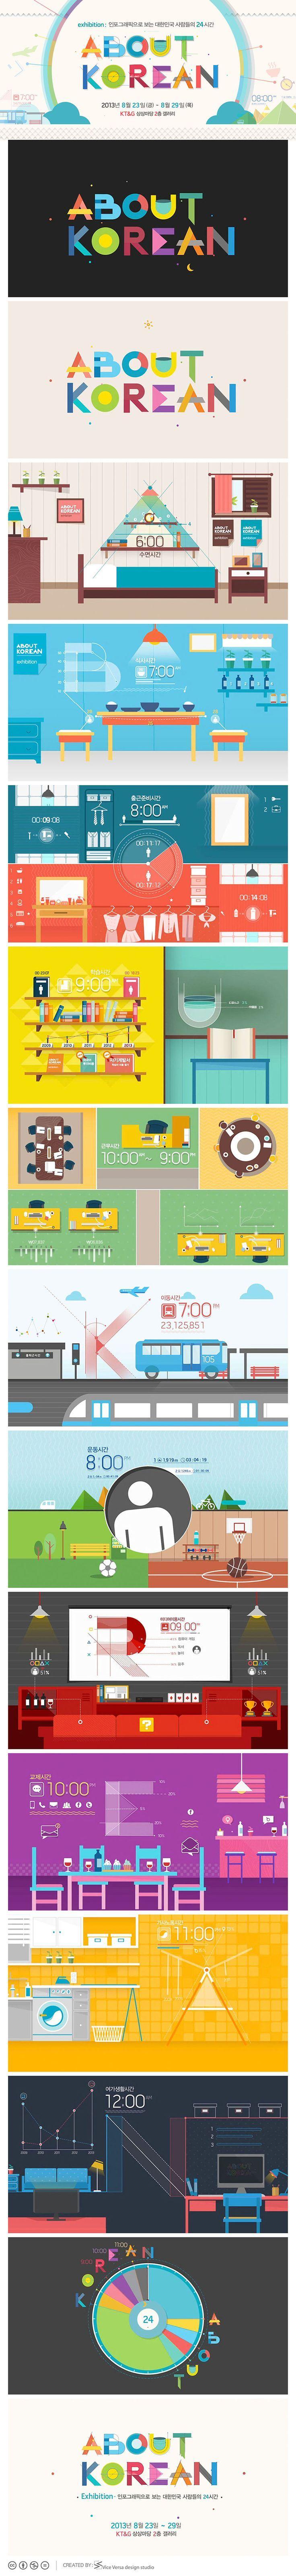 ABOUT KOREAN exhibition :     24     ABOUT KOREAN 11      11  24    . http://vimeo.com/69441538 #infographics